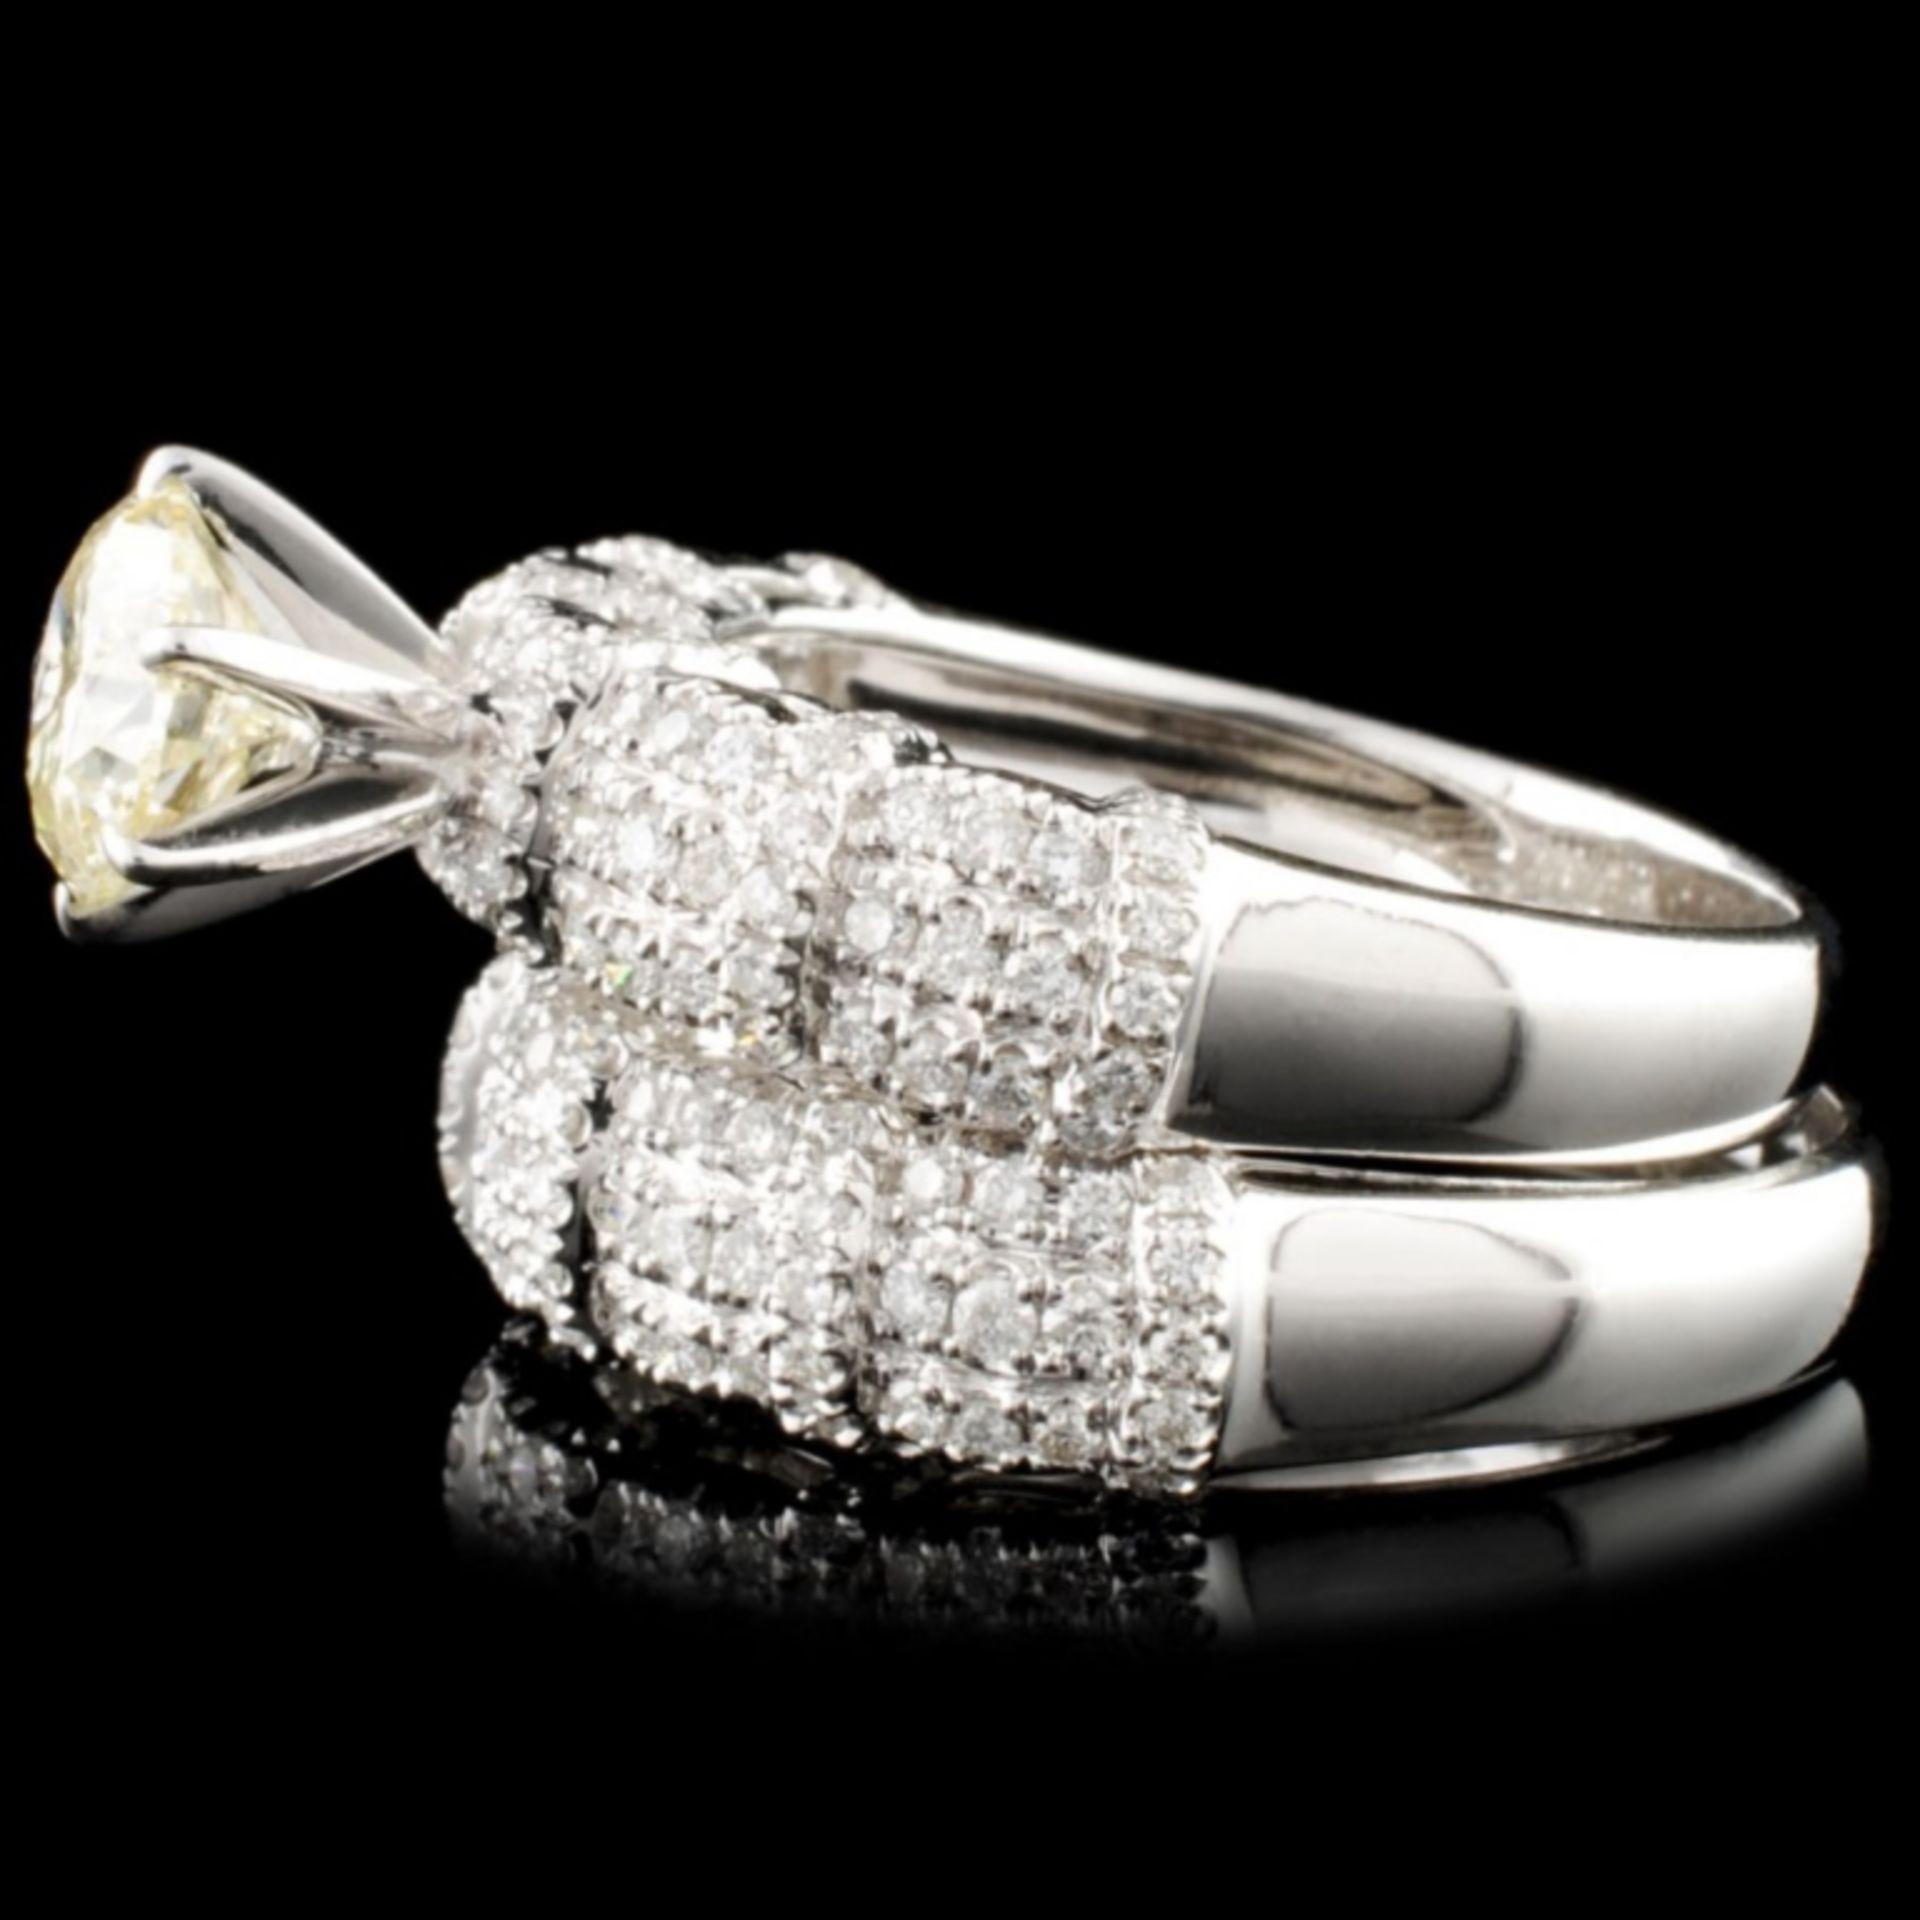 18K Gold 1.92ctw Diamond Ring - Image 3 of 4